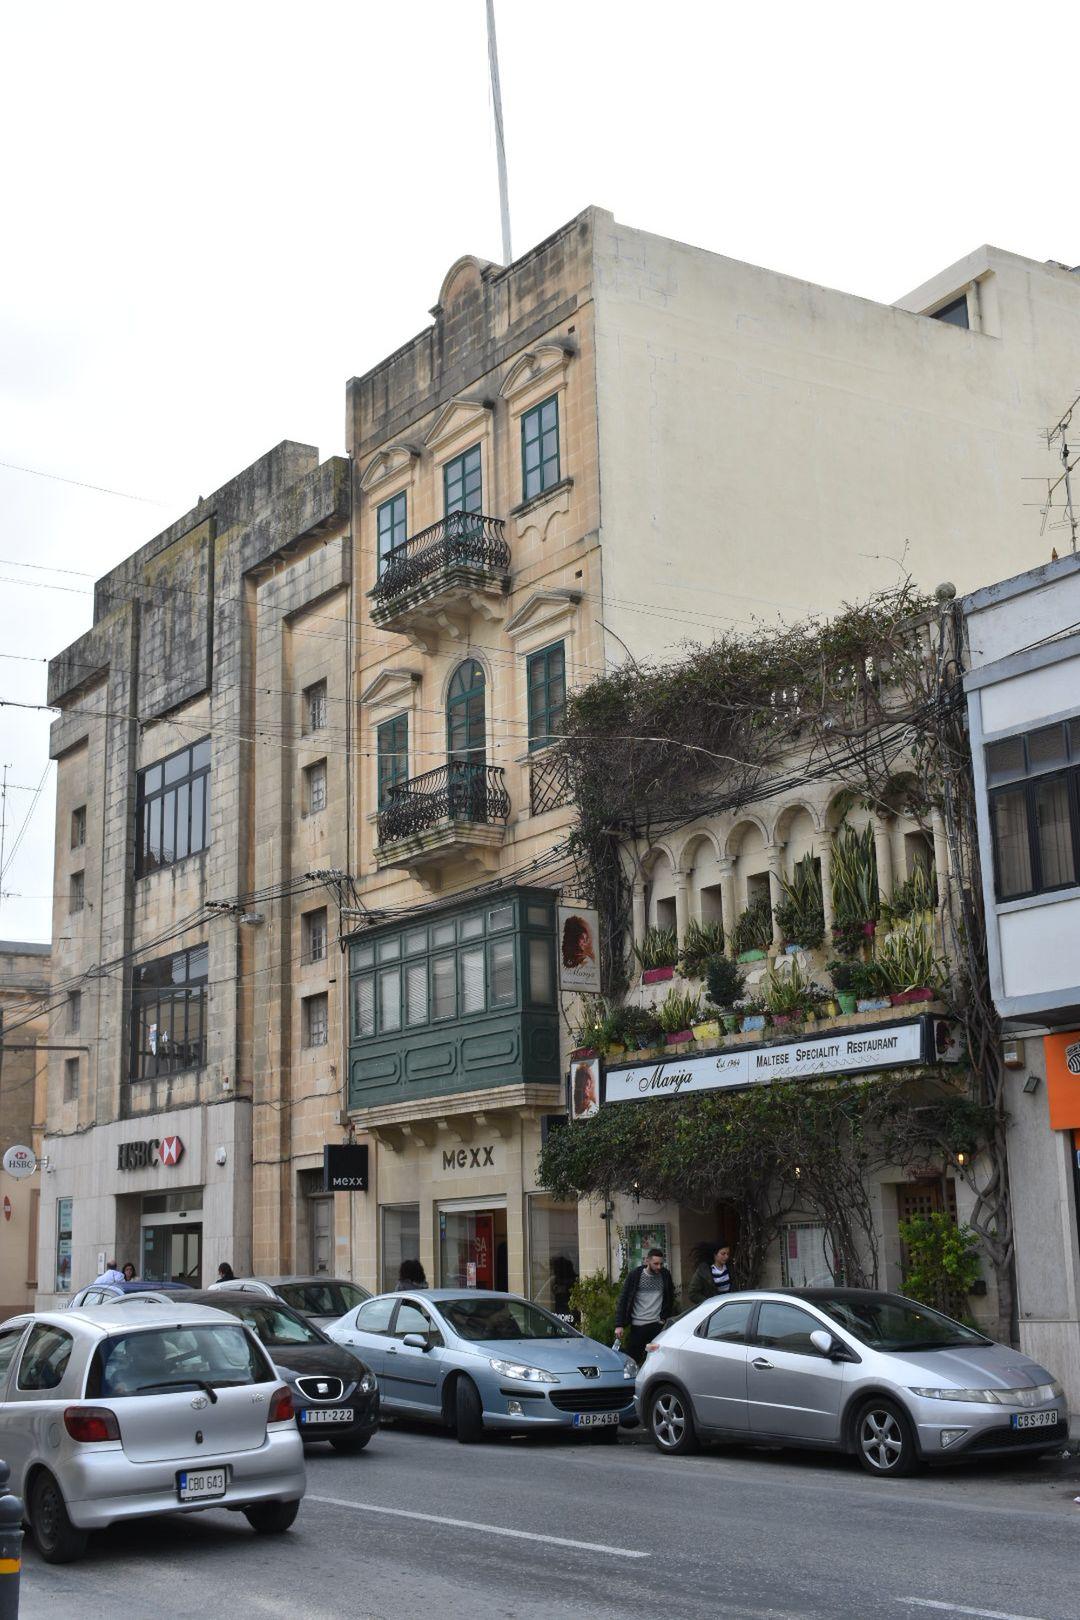 Abp 656 file:mosta former cinema, now bank, and maltese restaurant